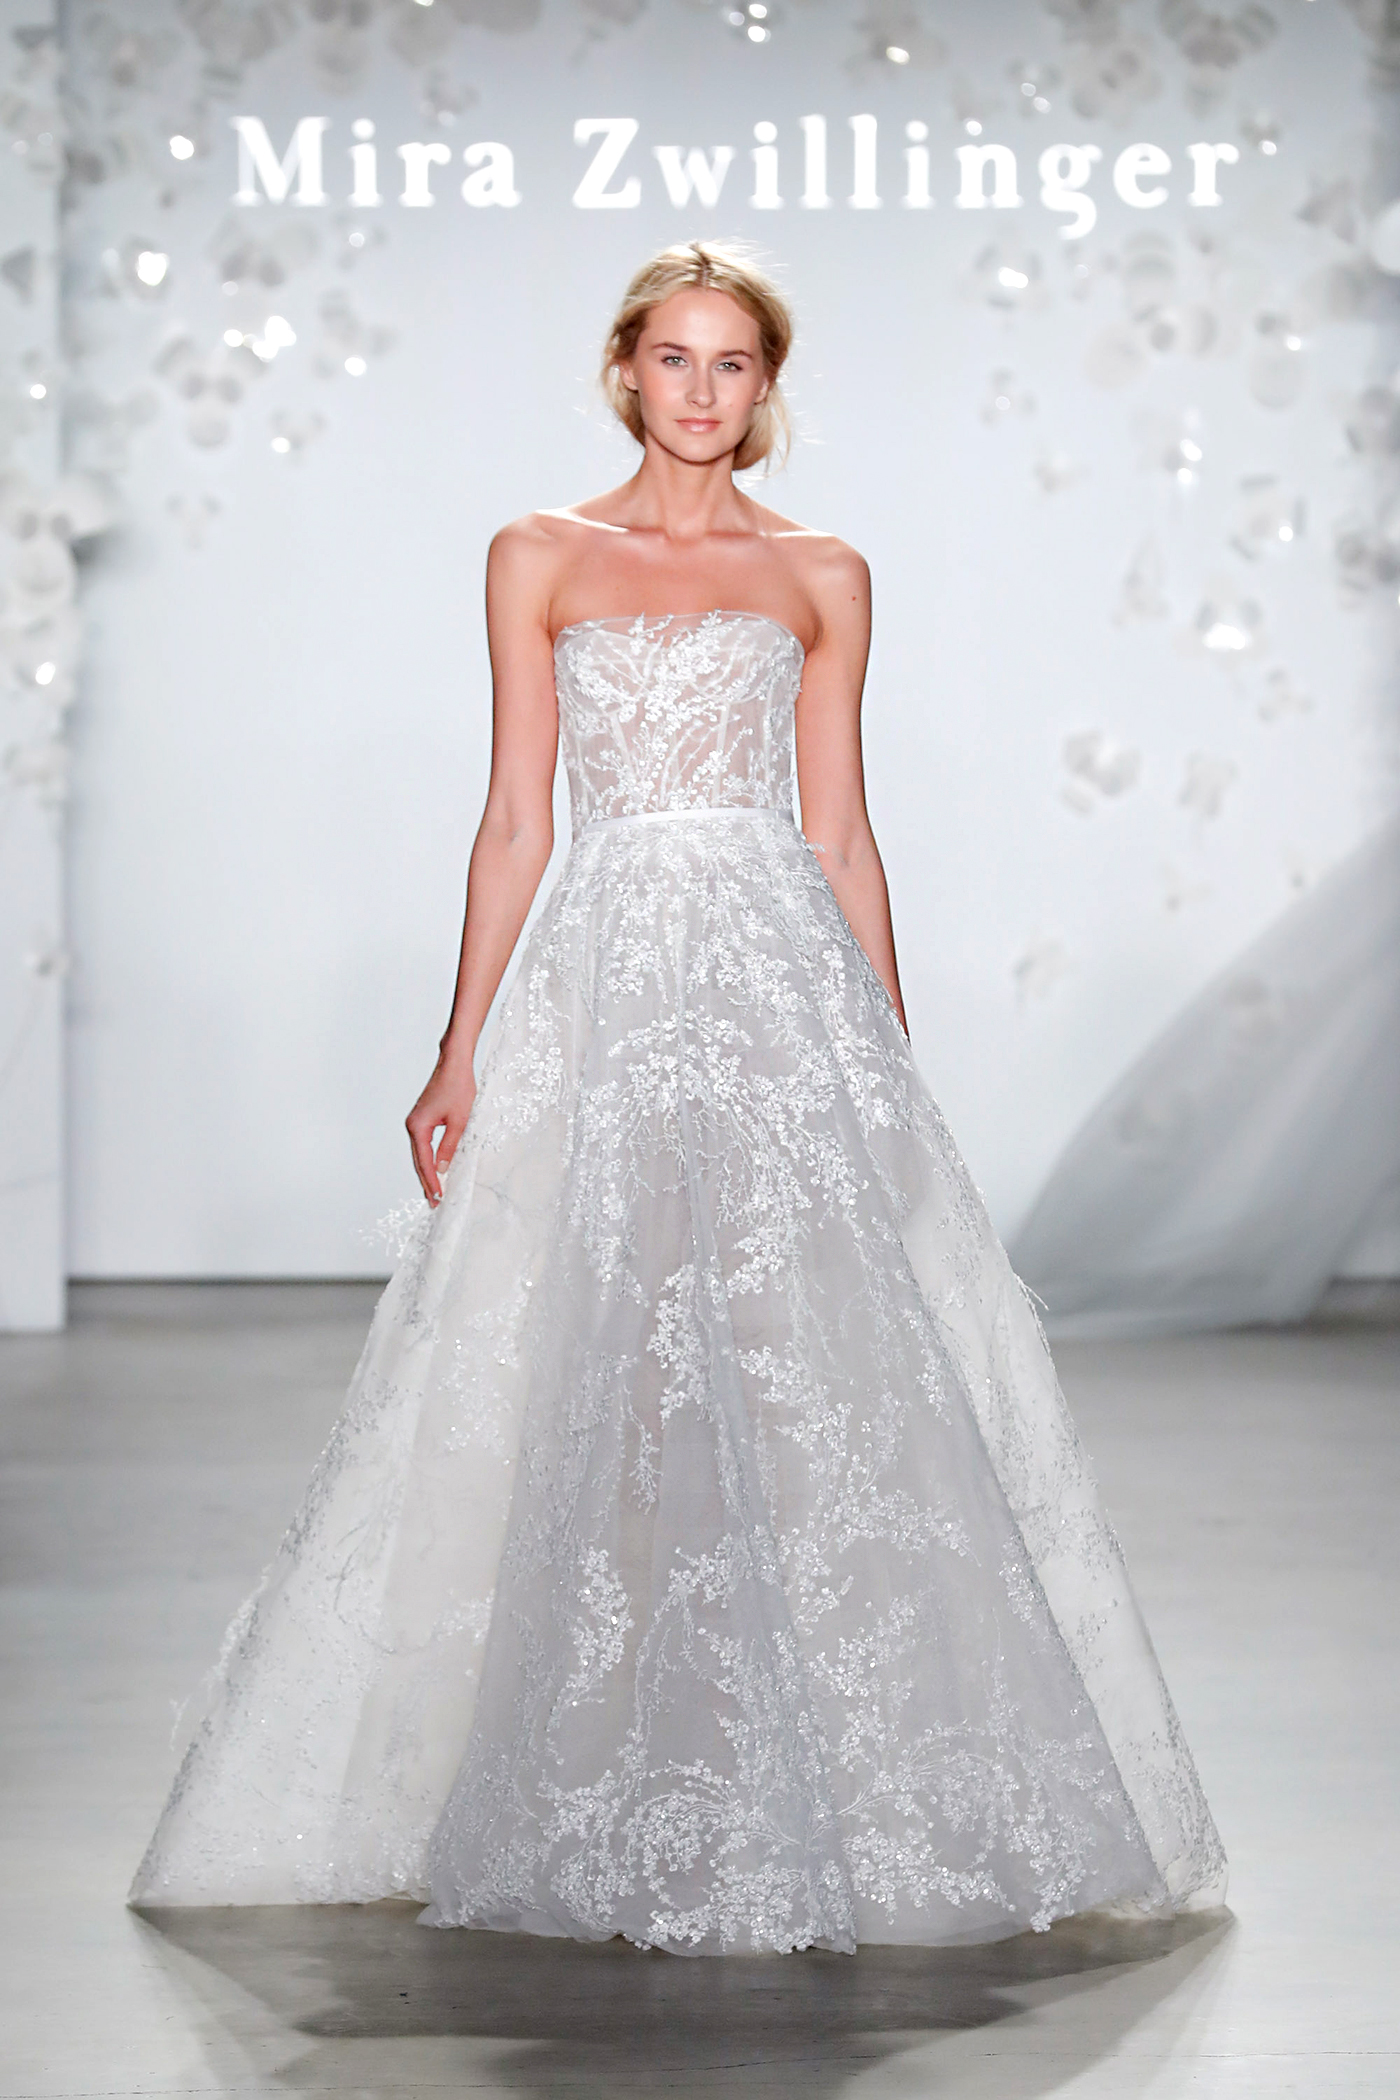 mira zwillinger strapless a-line wedding dress spring 2020